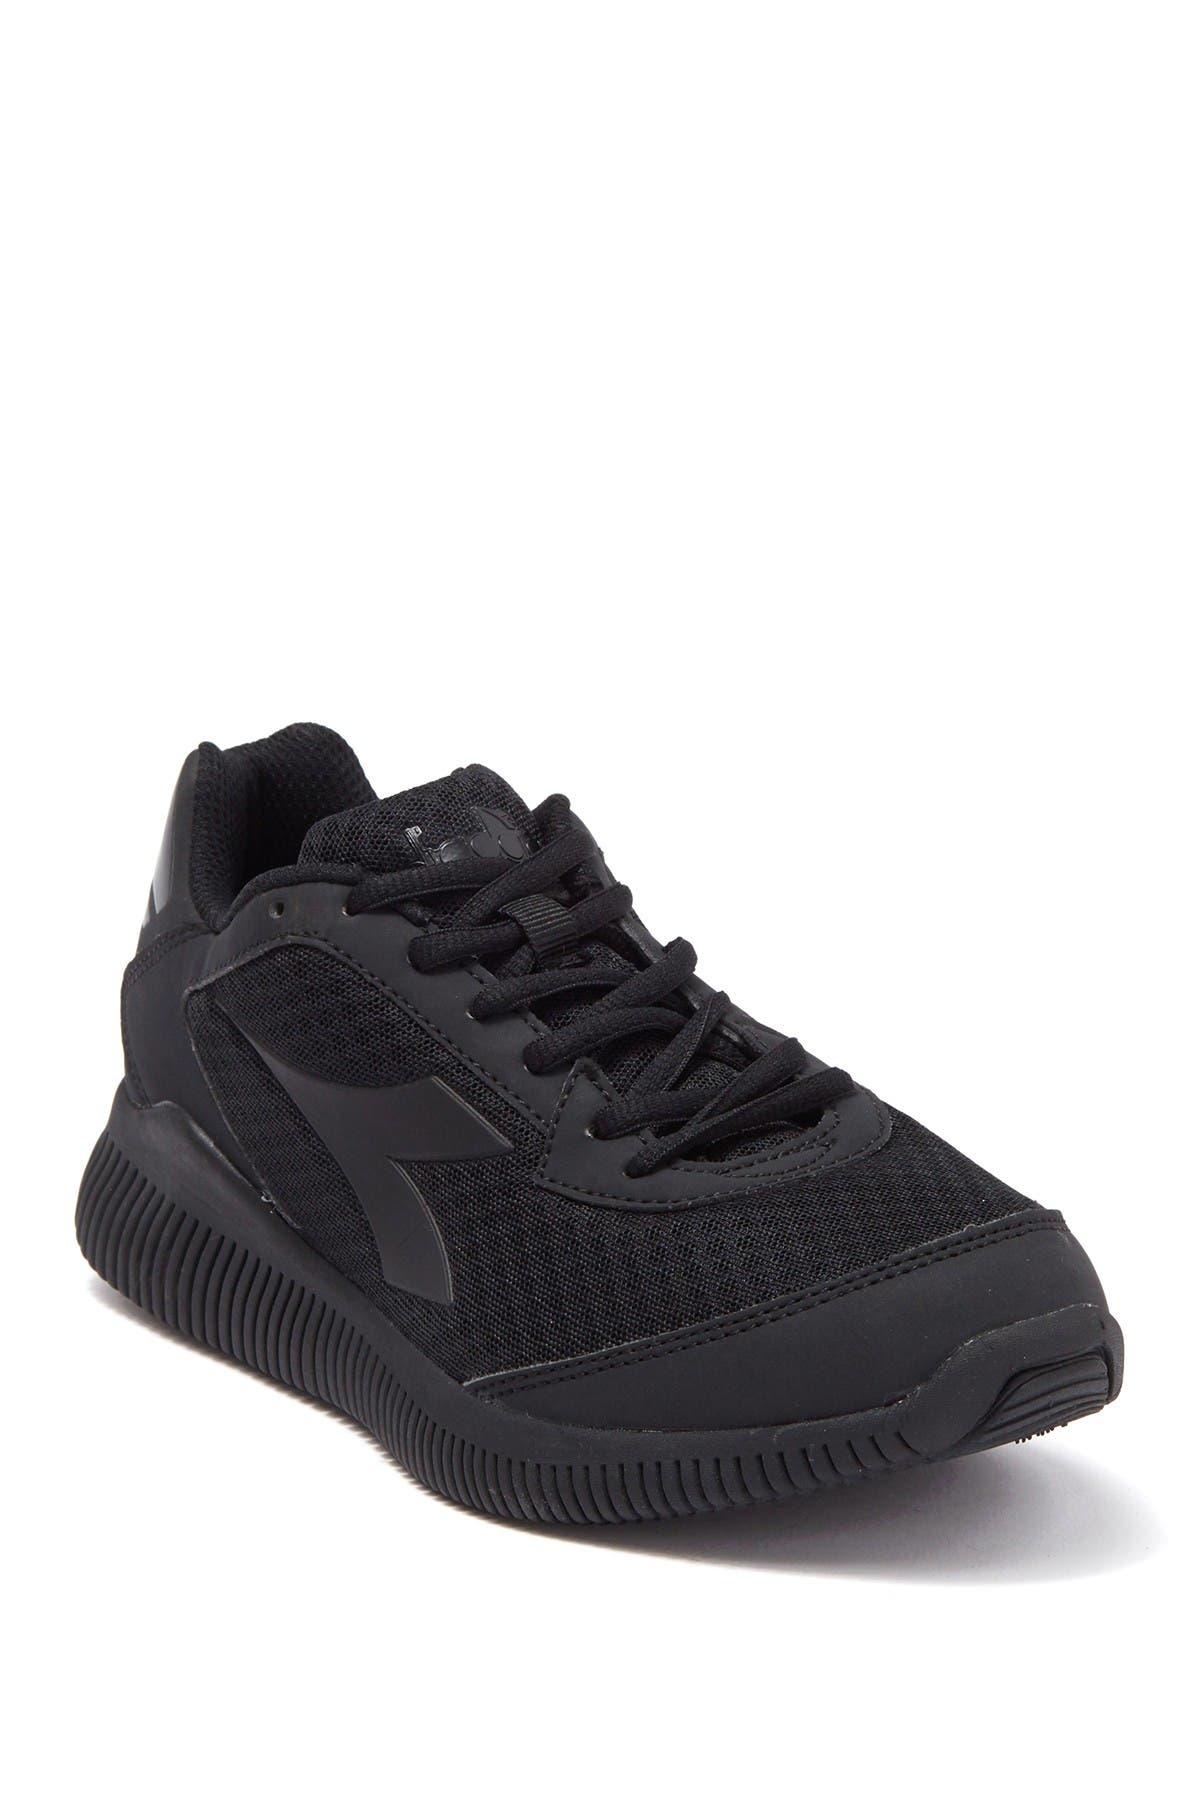 Image of Diadora Eagle Running Shoe